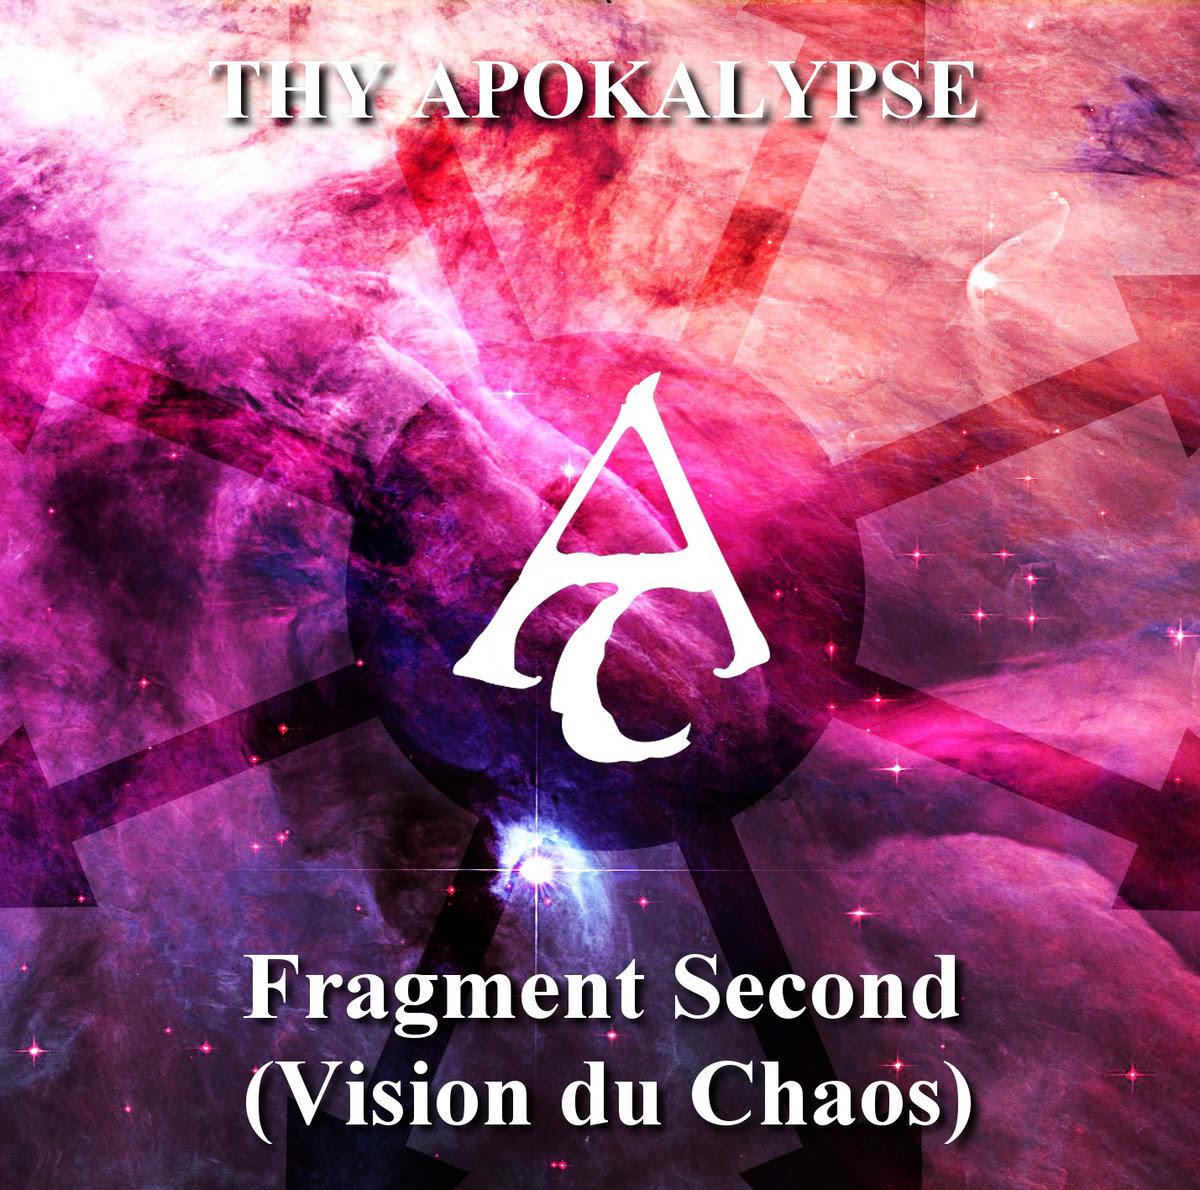 Thy Apokalypse - Fragment Second (Vision du Chaos) (2013)